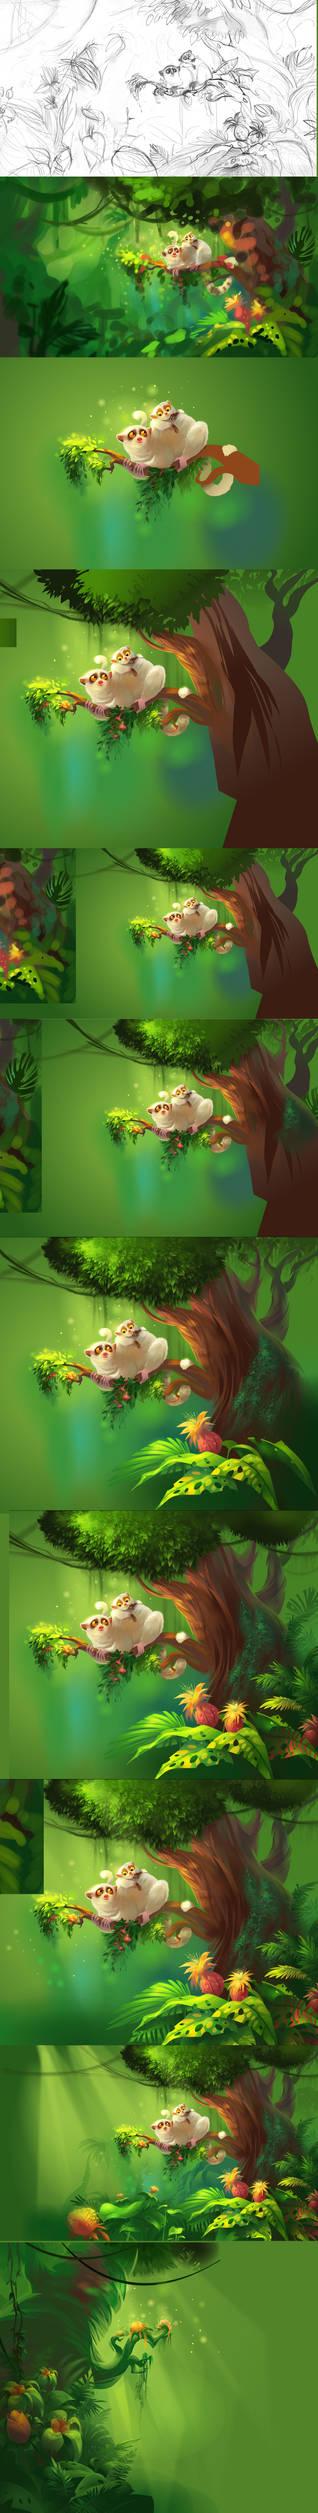 Jungle process